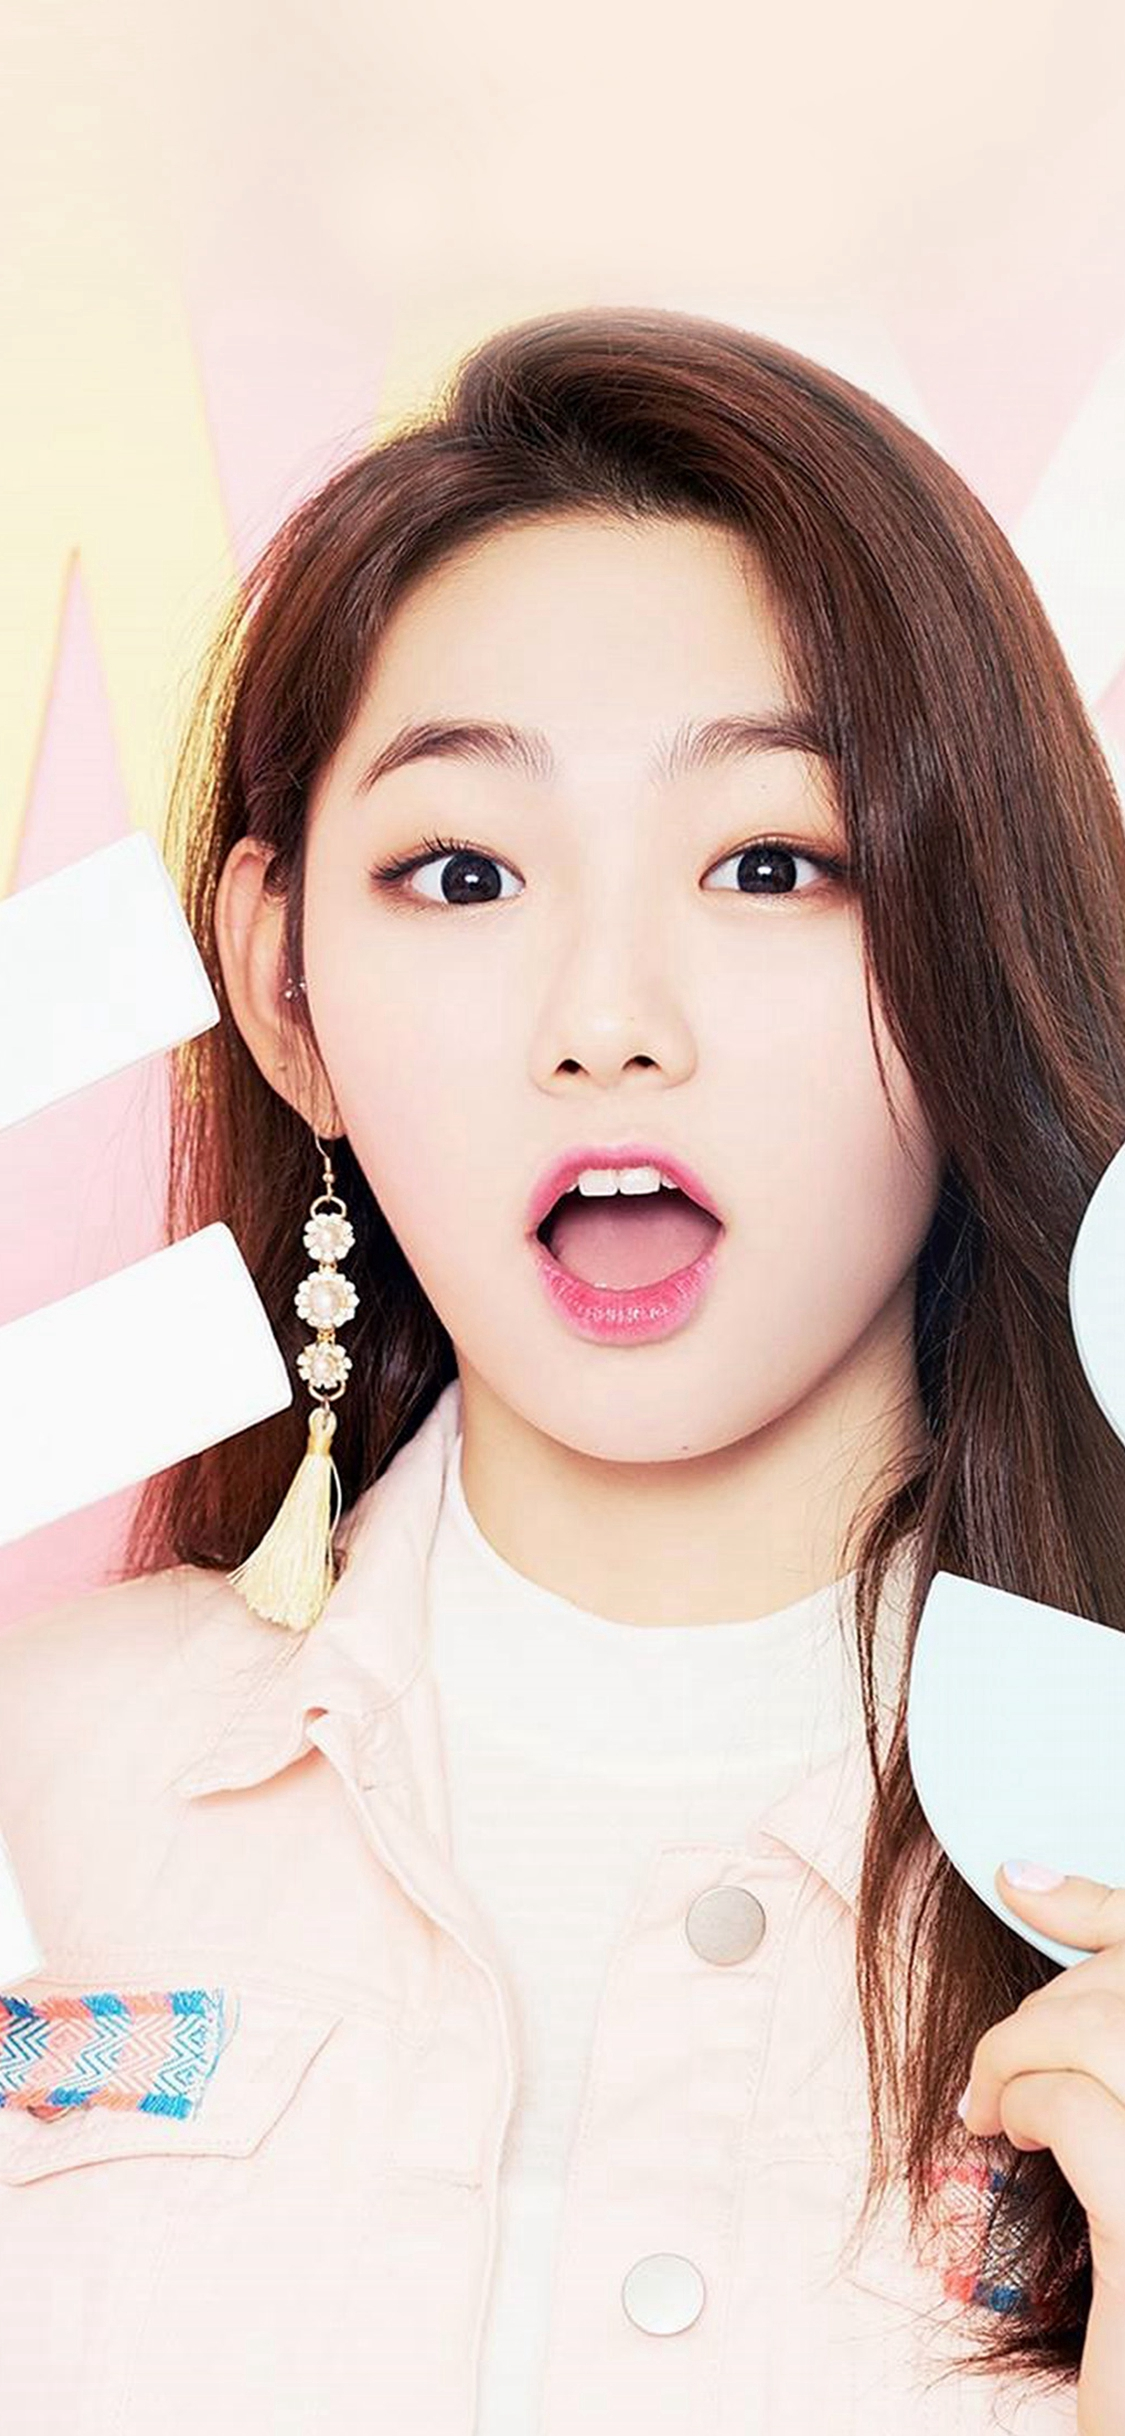 Girl Ioi Pink Cute iPhone X wallpaper